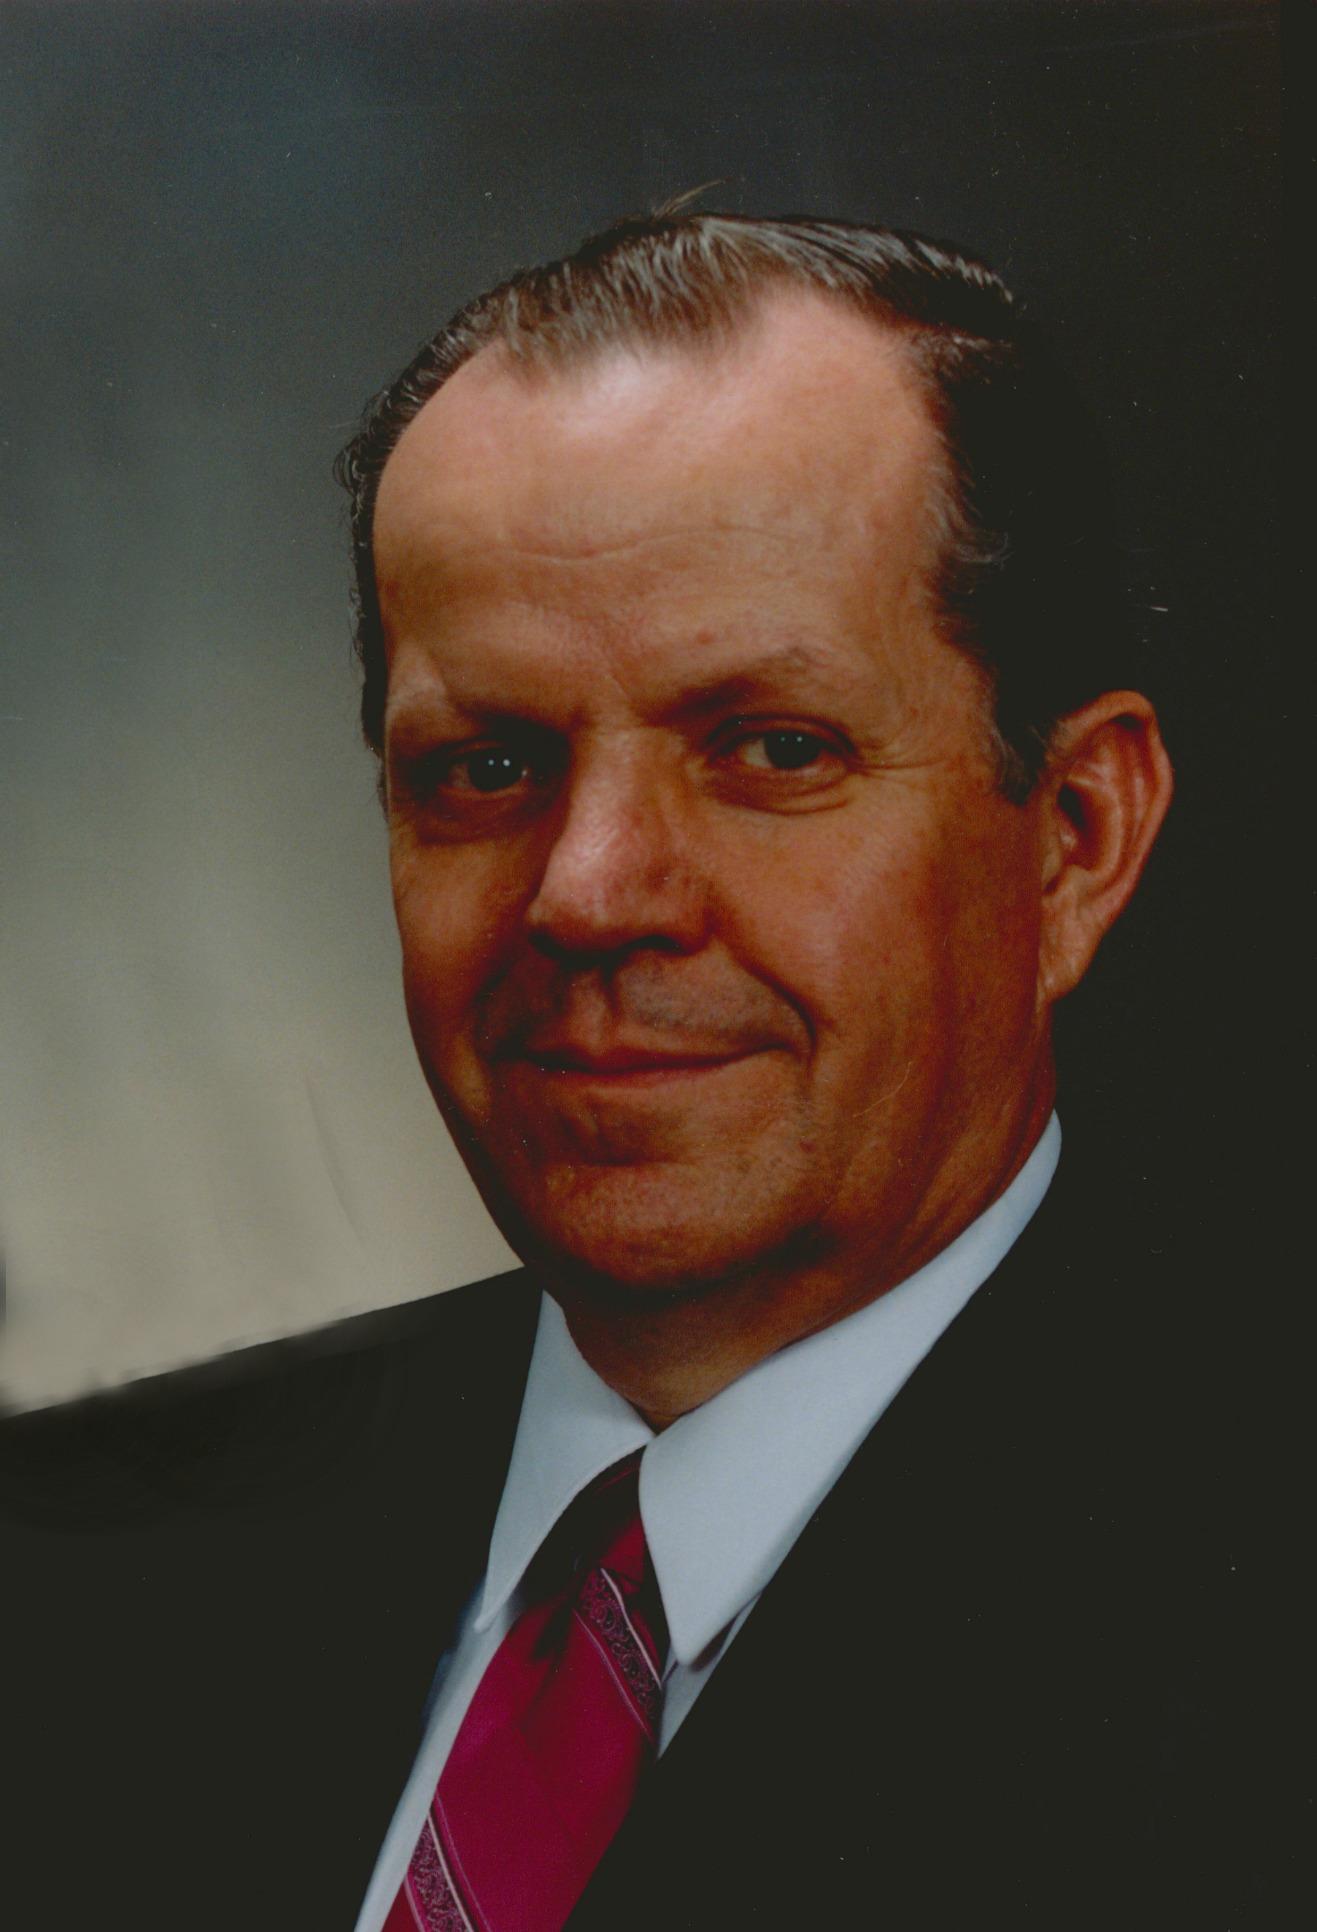 Donald Leroy Daniels